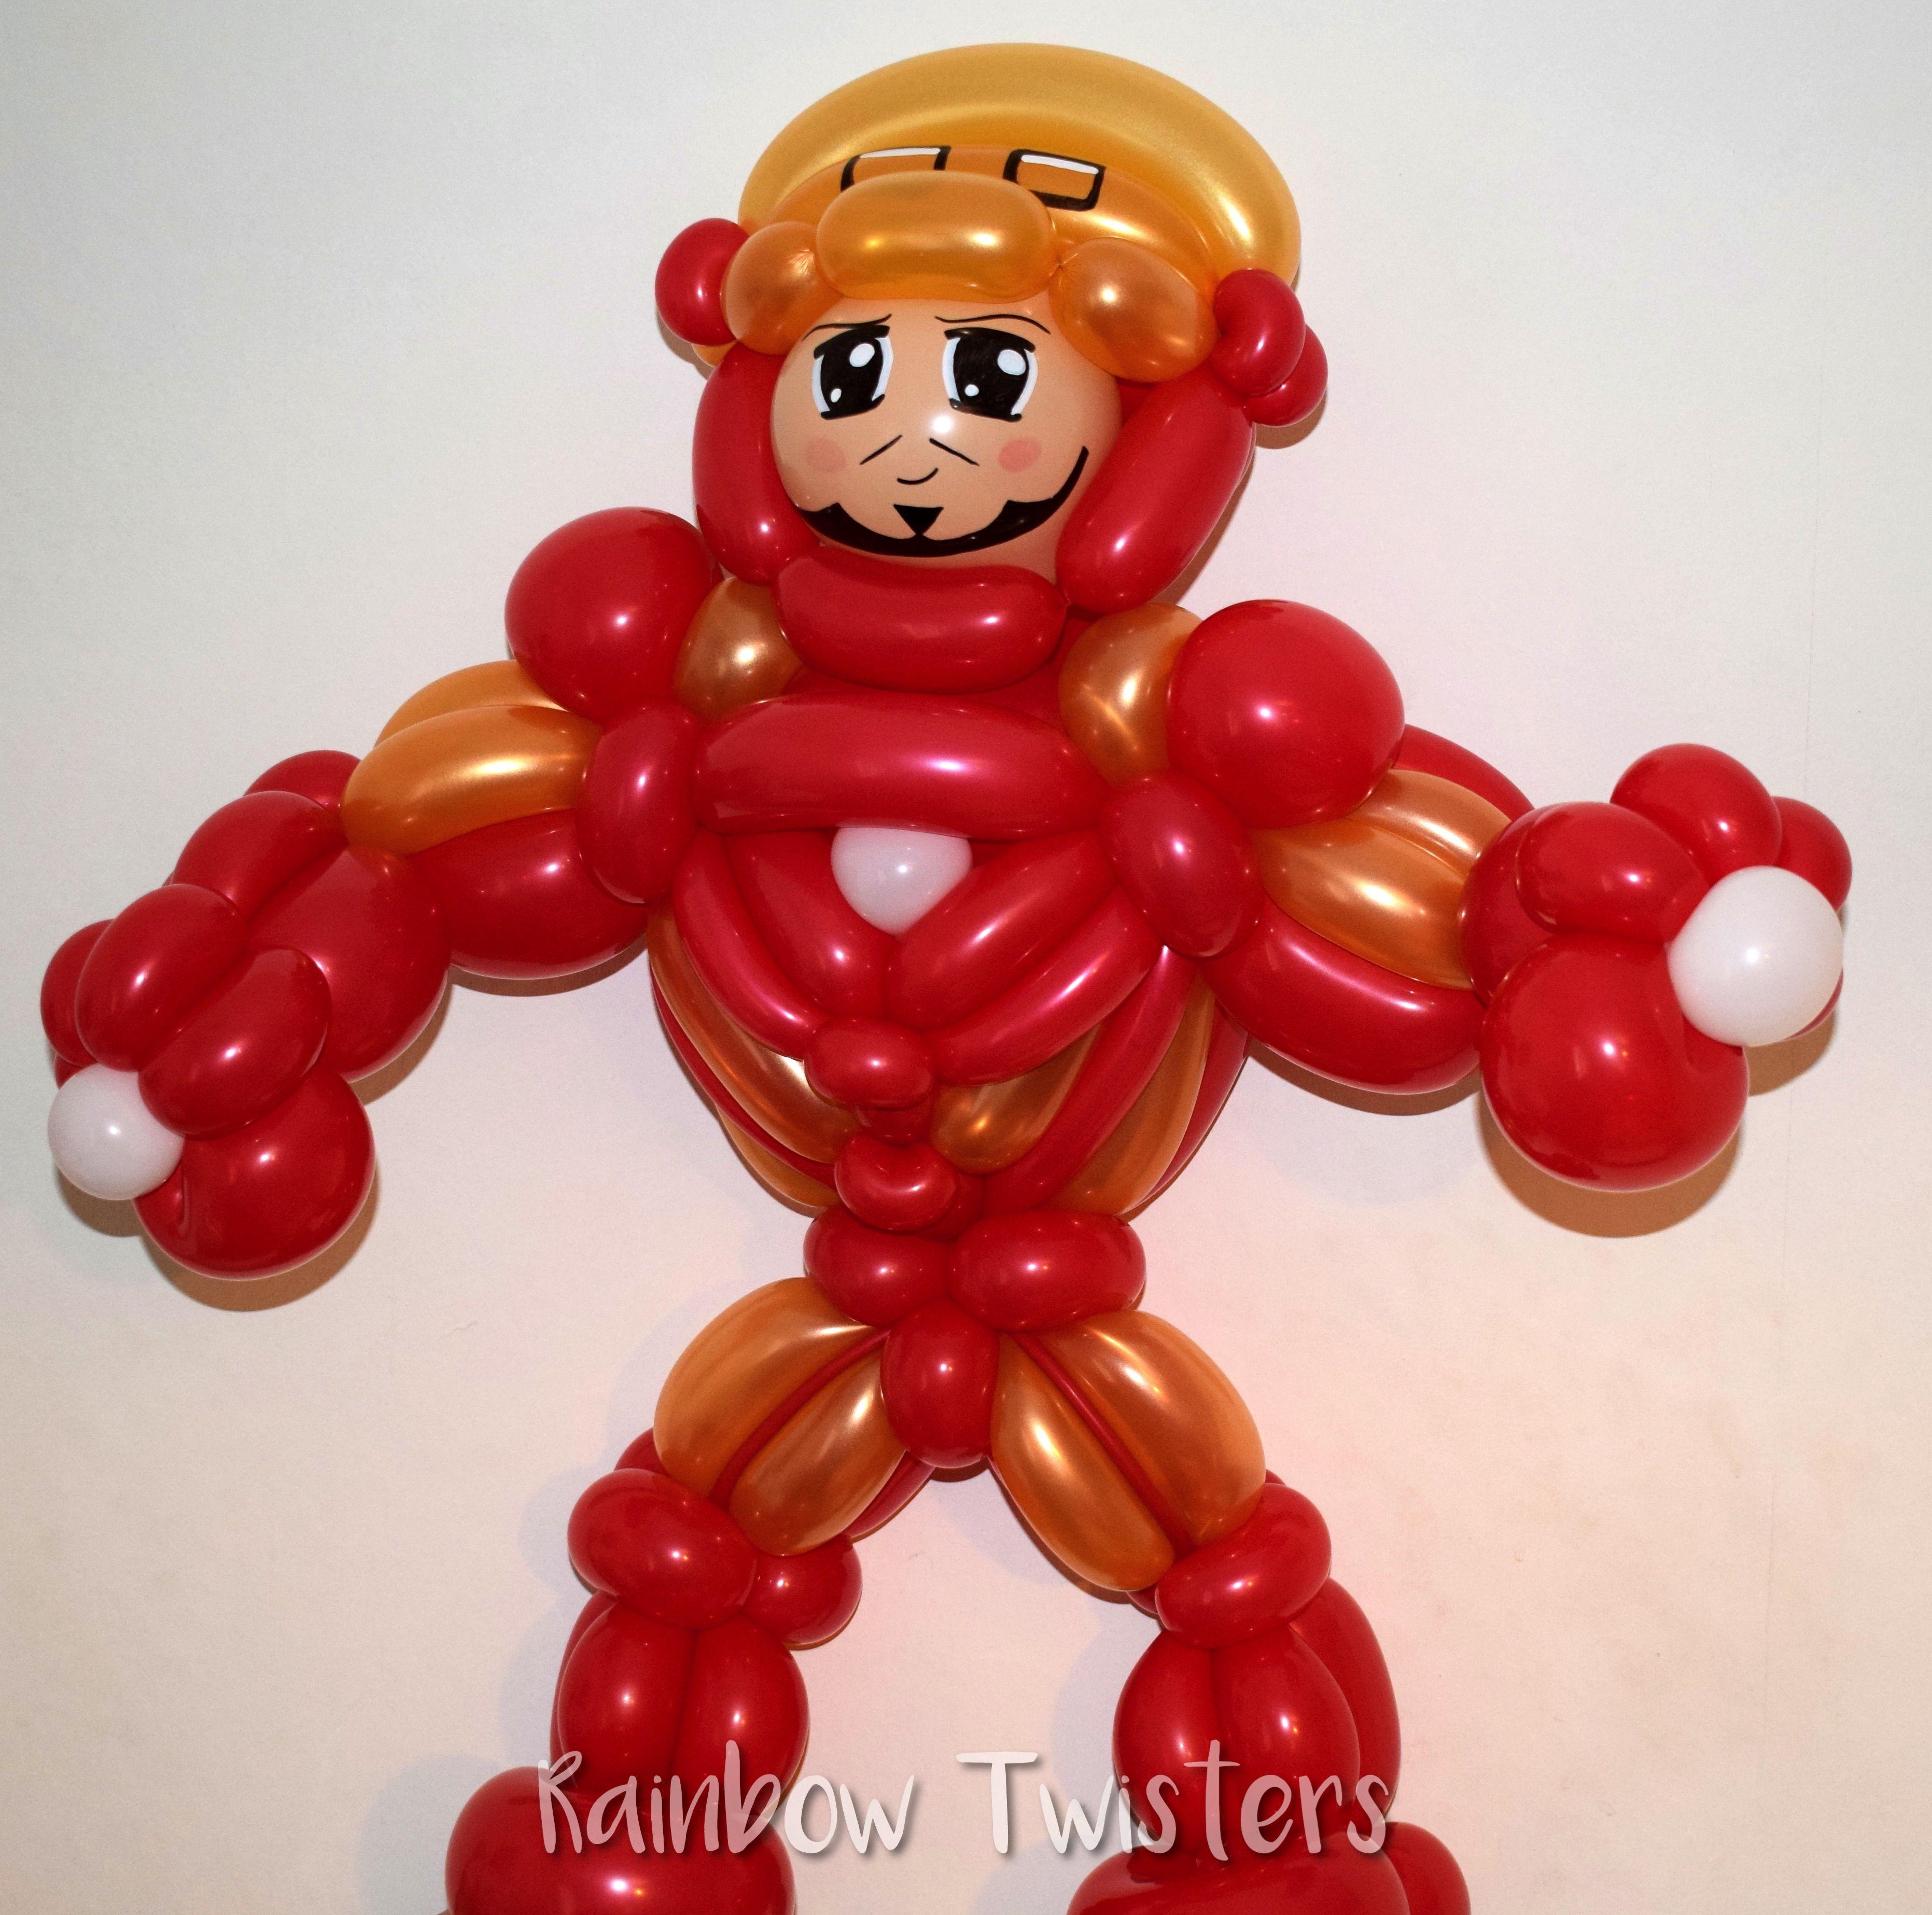 Ironman balloon model made by Rainbow Twisters www.RainbowTwisters.com